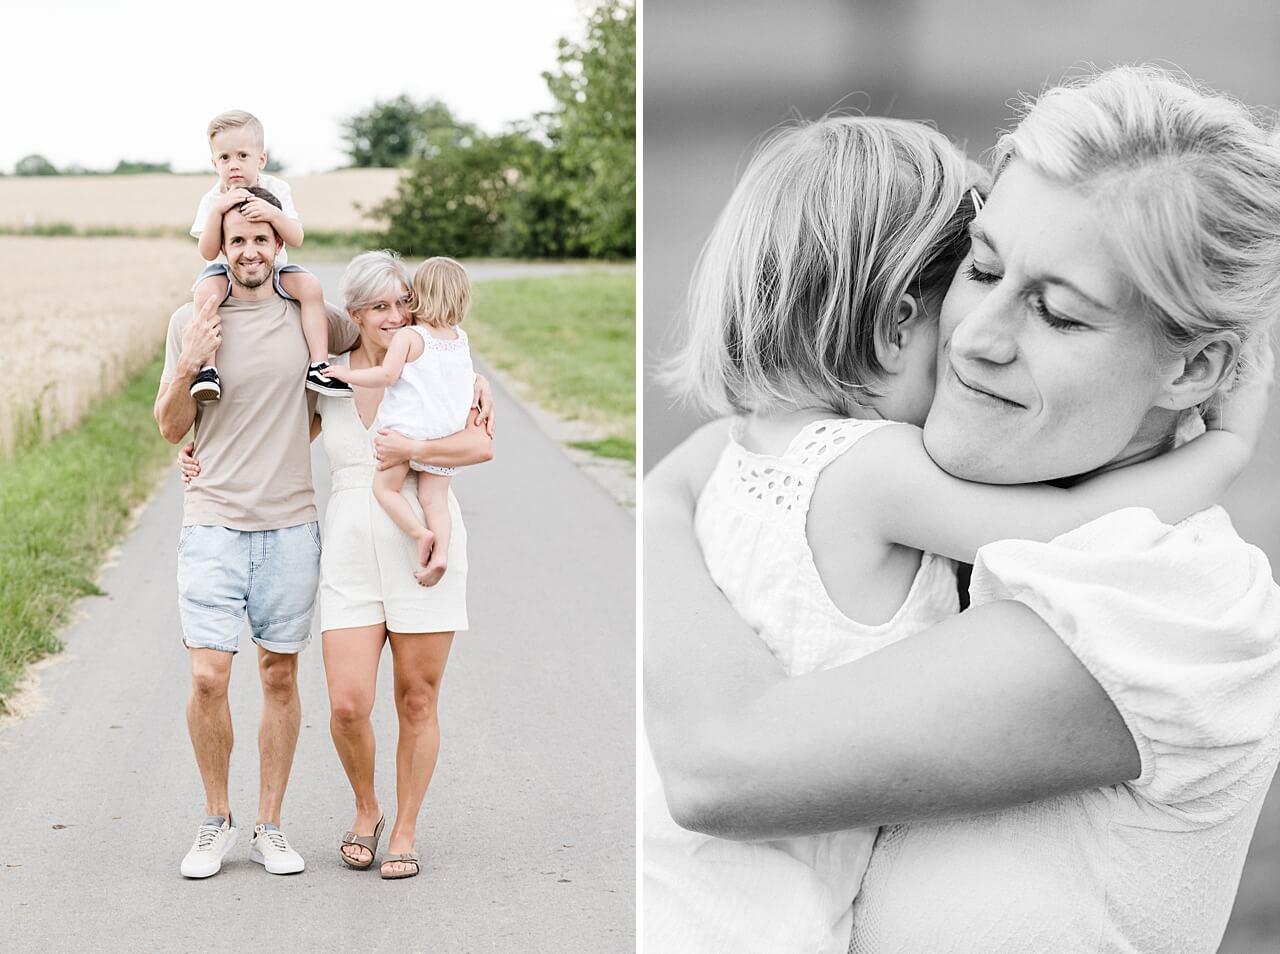 Rebecca Conte Fotografie: Familienbilder in Remseck 31